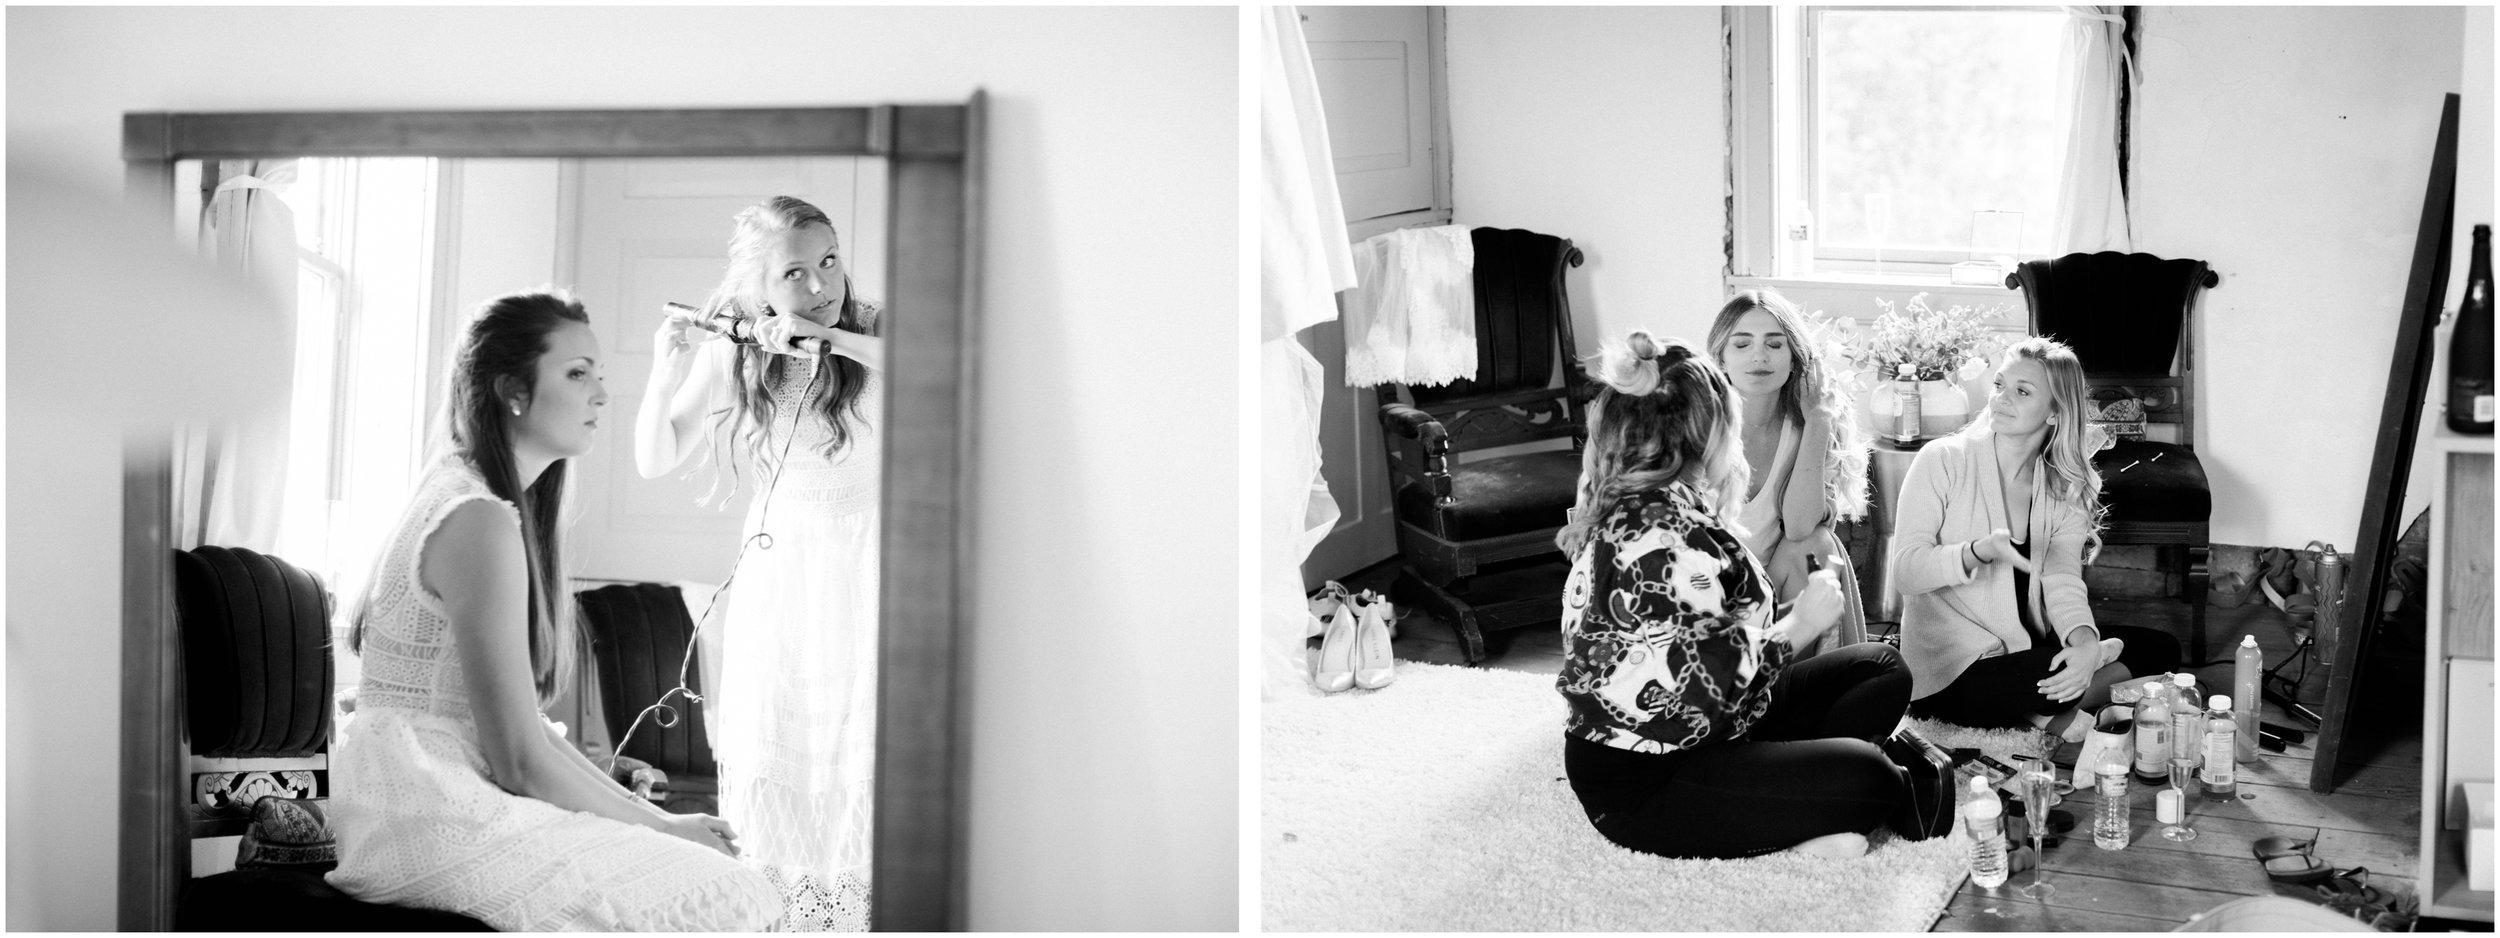 pittsburgh-wedding-photographer-garden-wedding-bumbleburgh-pennsylvania-elegant-simple-wedding-4.jpg